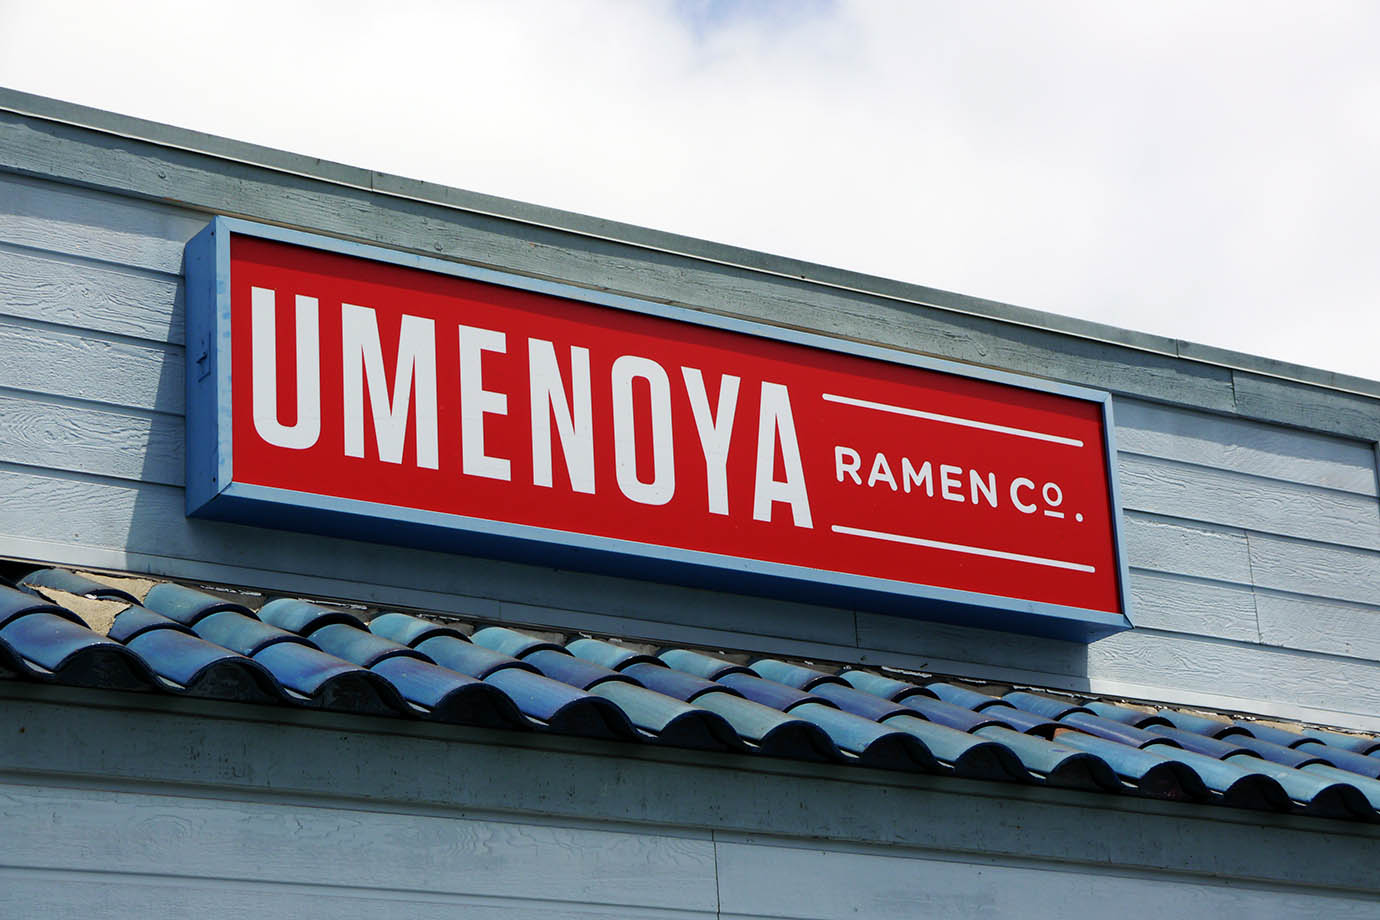 umenoya-ramen-jiro4